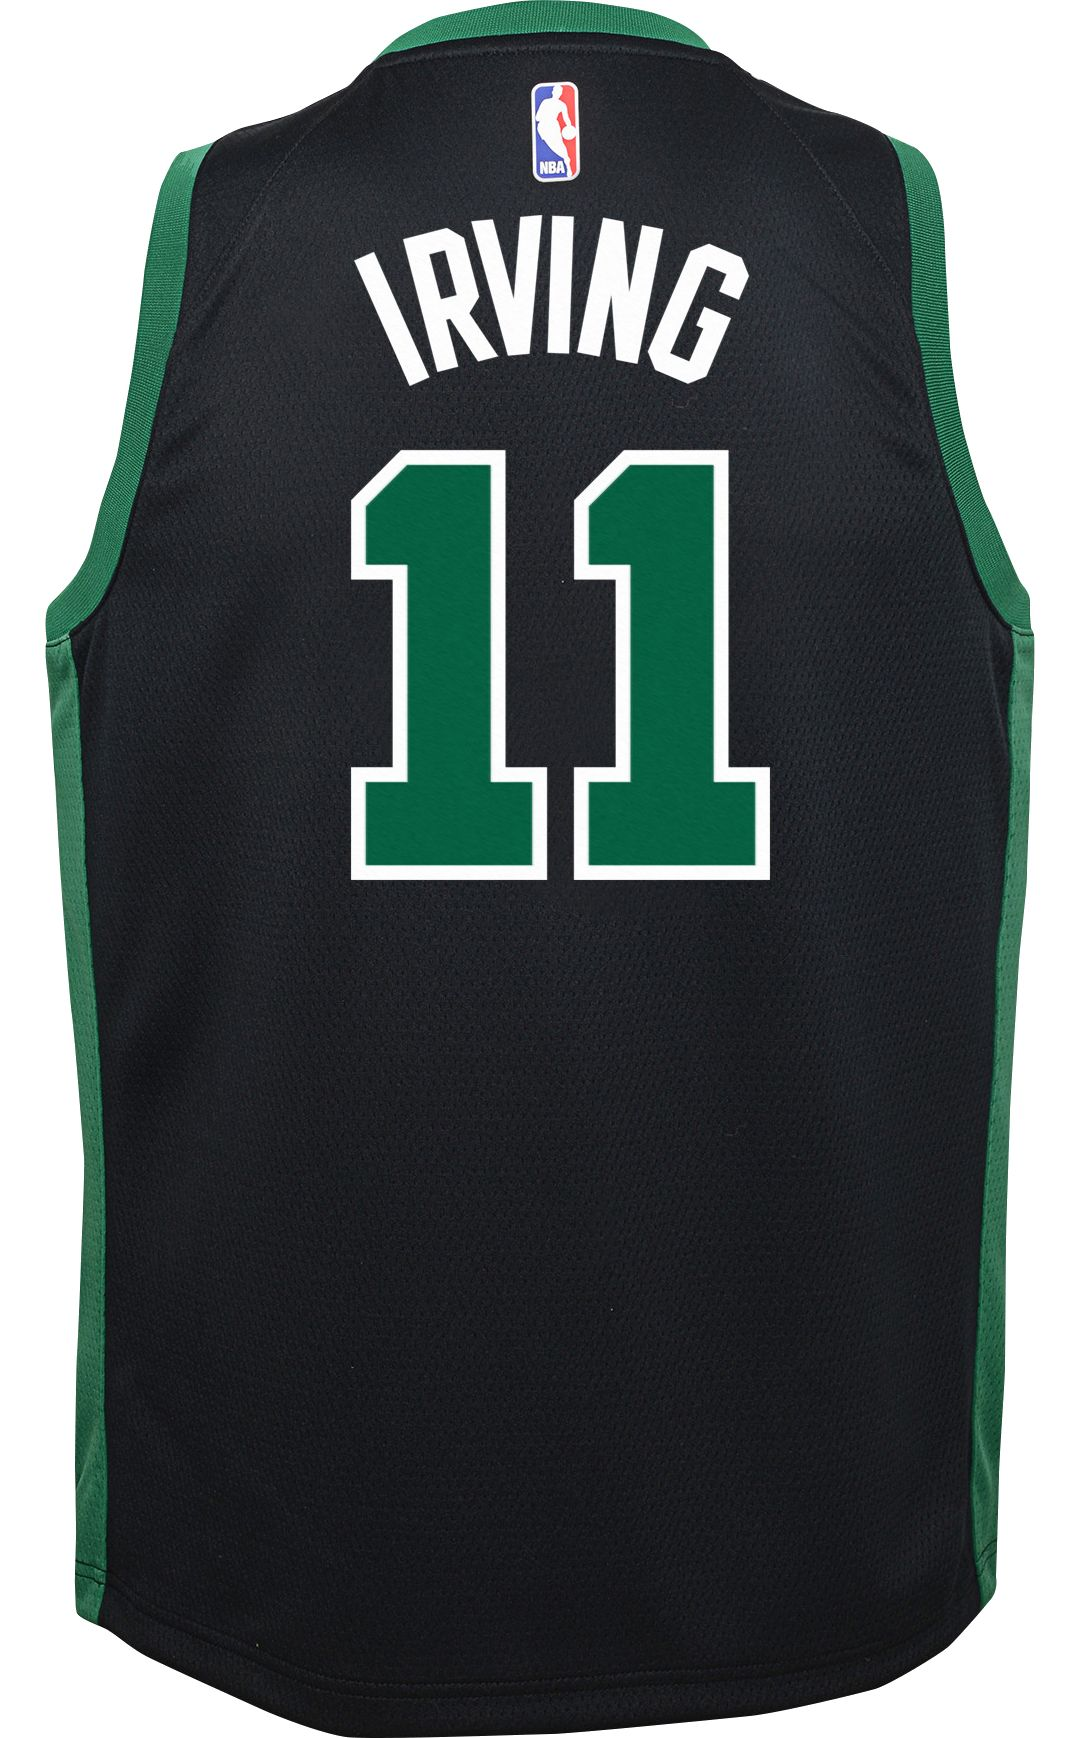 ee4aa7f34c01da Nike Youth Boston Celtics Kyrie Irving #11 Black Dri-FIT Swingman ...